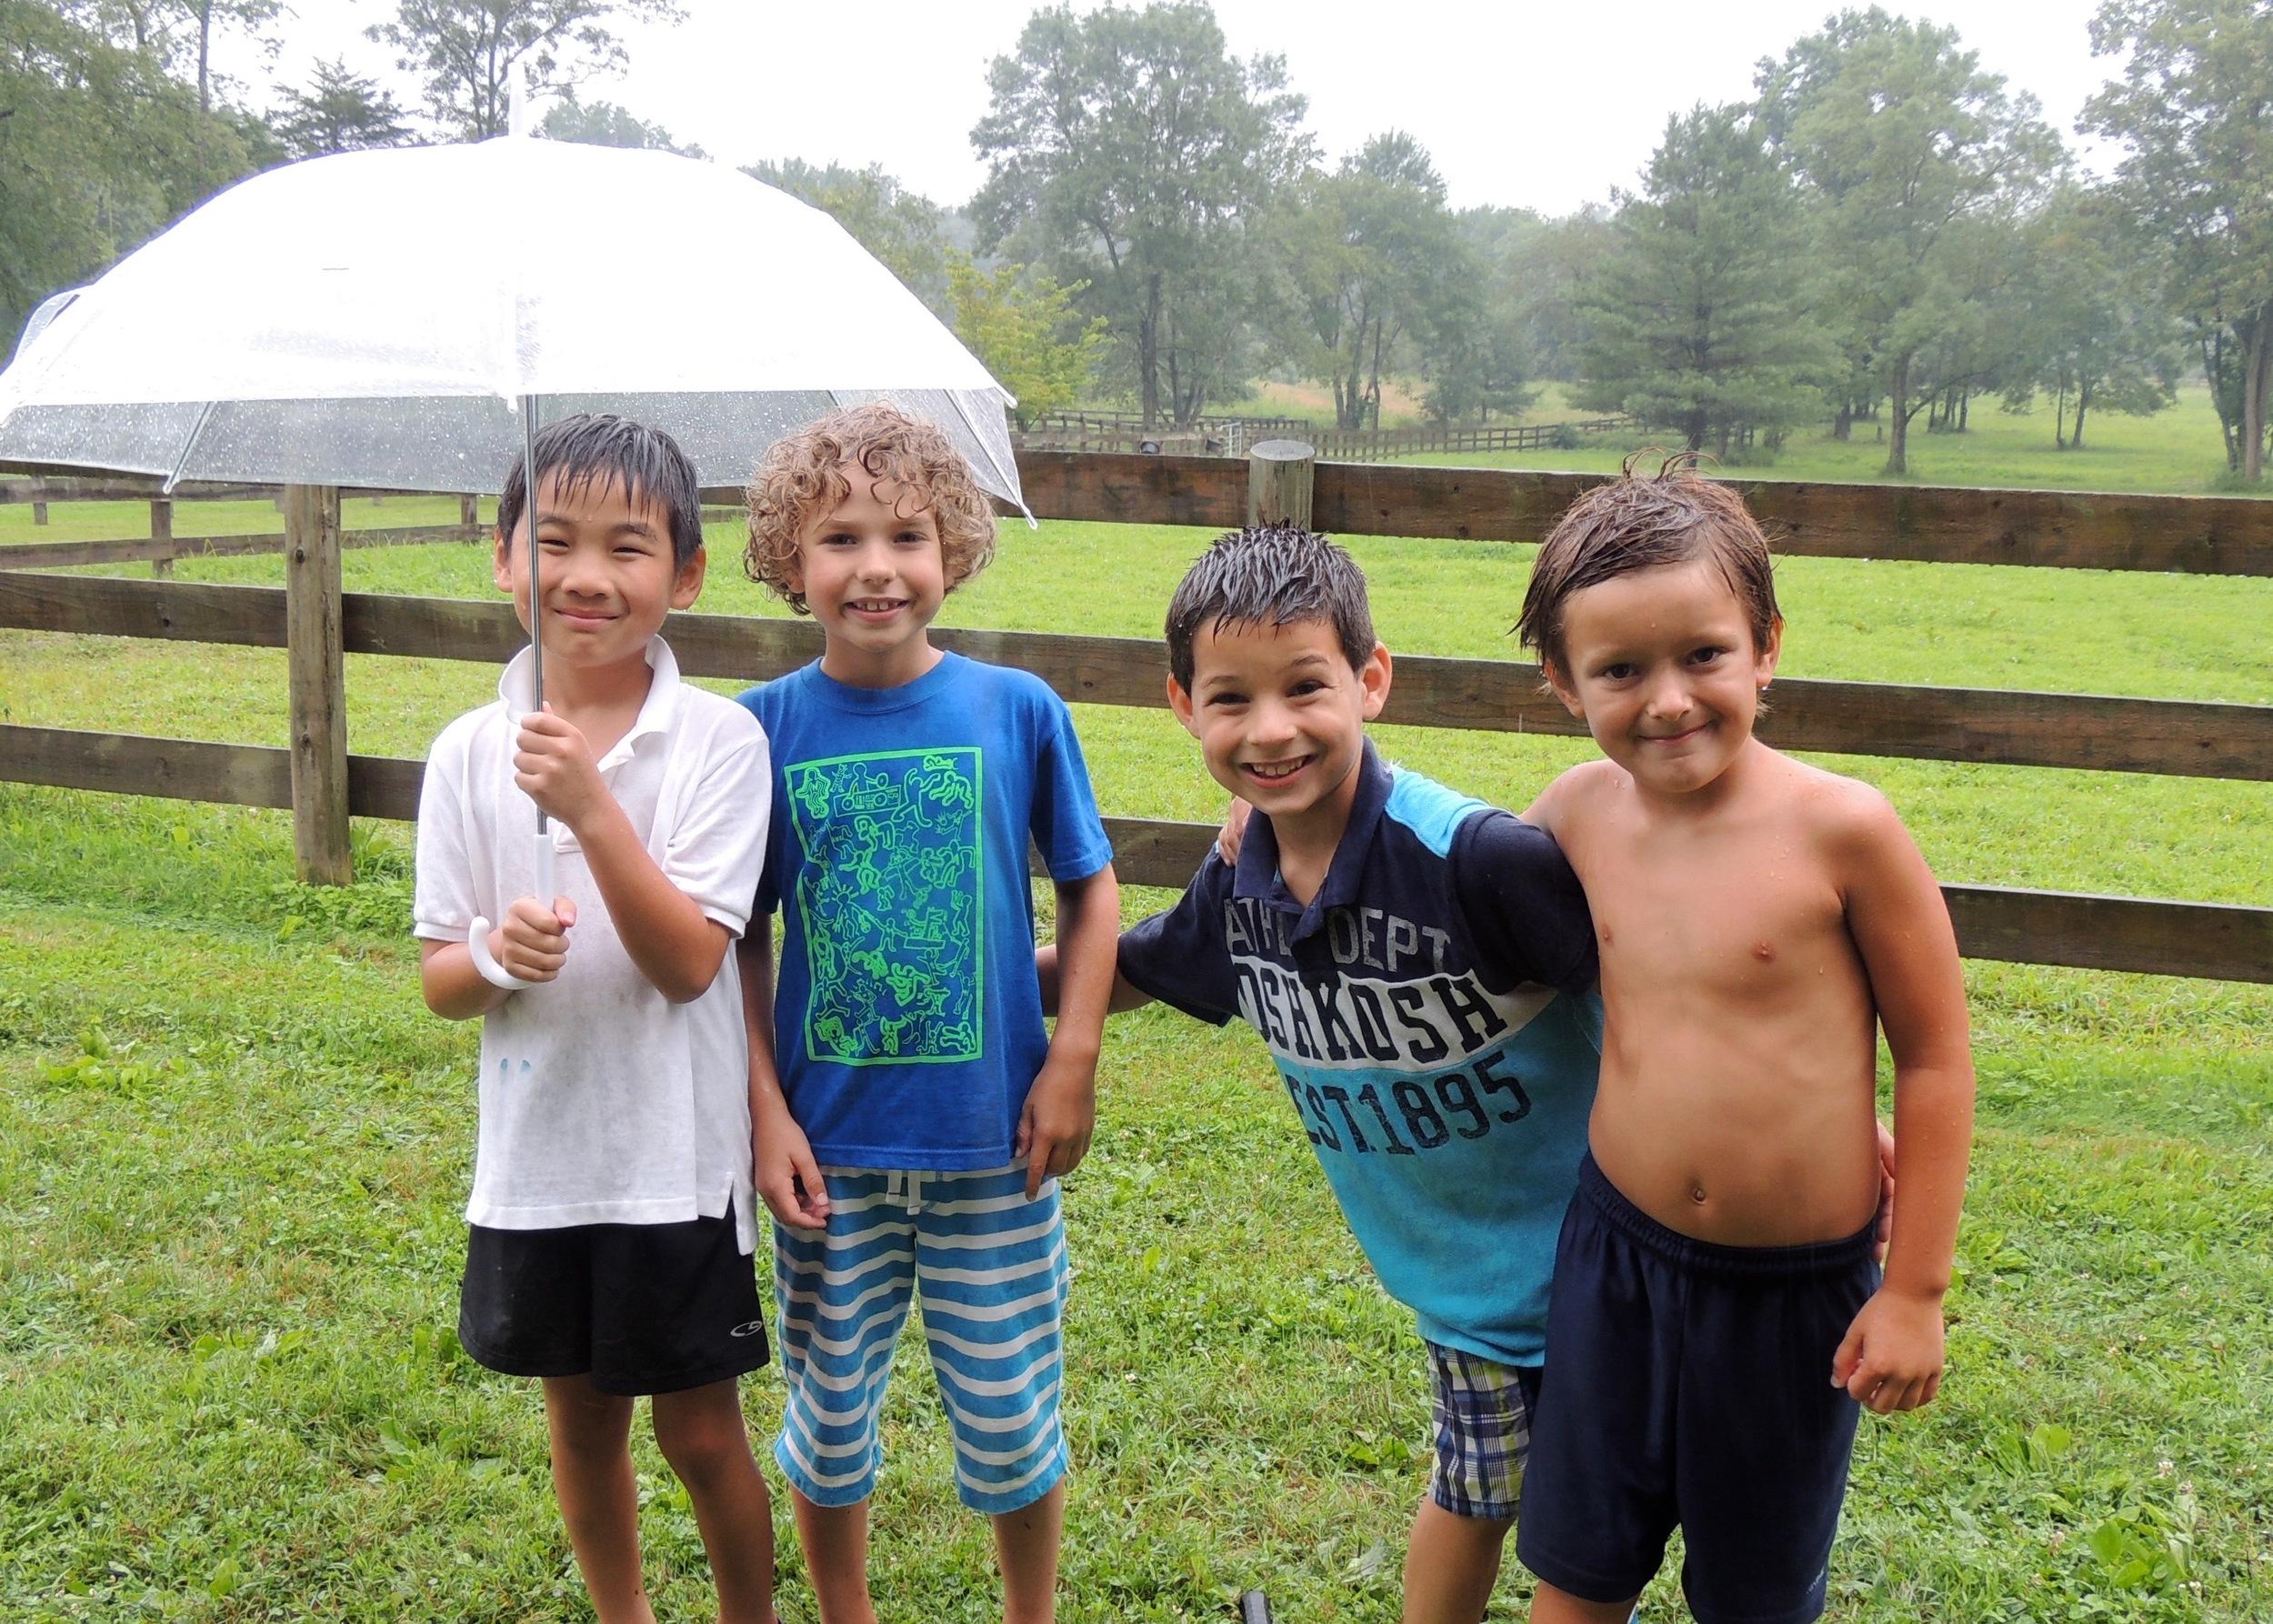 Rainy days are fun!